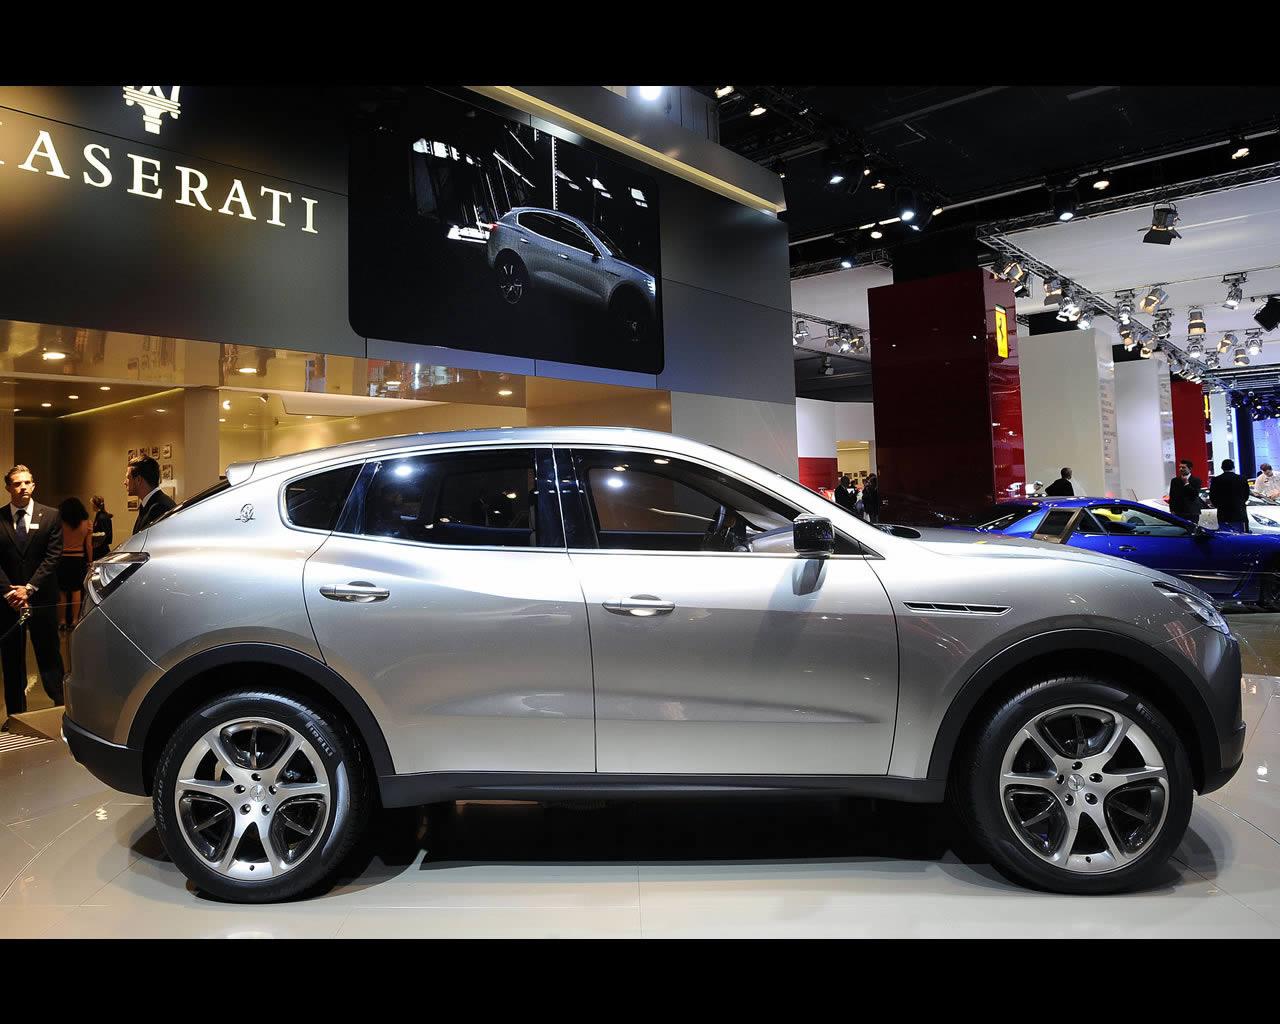 http://www.autoconcept-reviews.com/cars_reviews/maserati/maserati-kubang-suv-concept-2011/wallpapers/maserati-kubang-suv-concept-2011-1.jpg